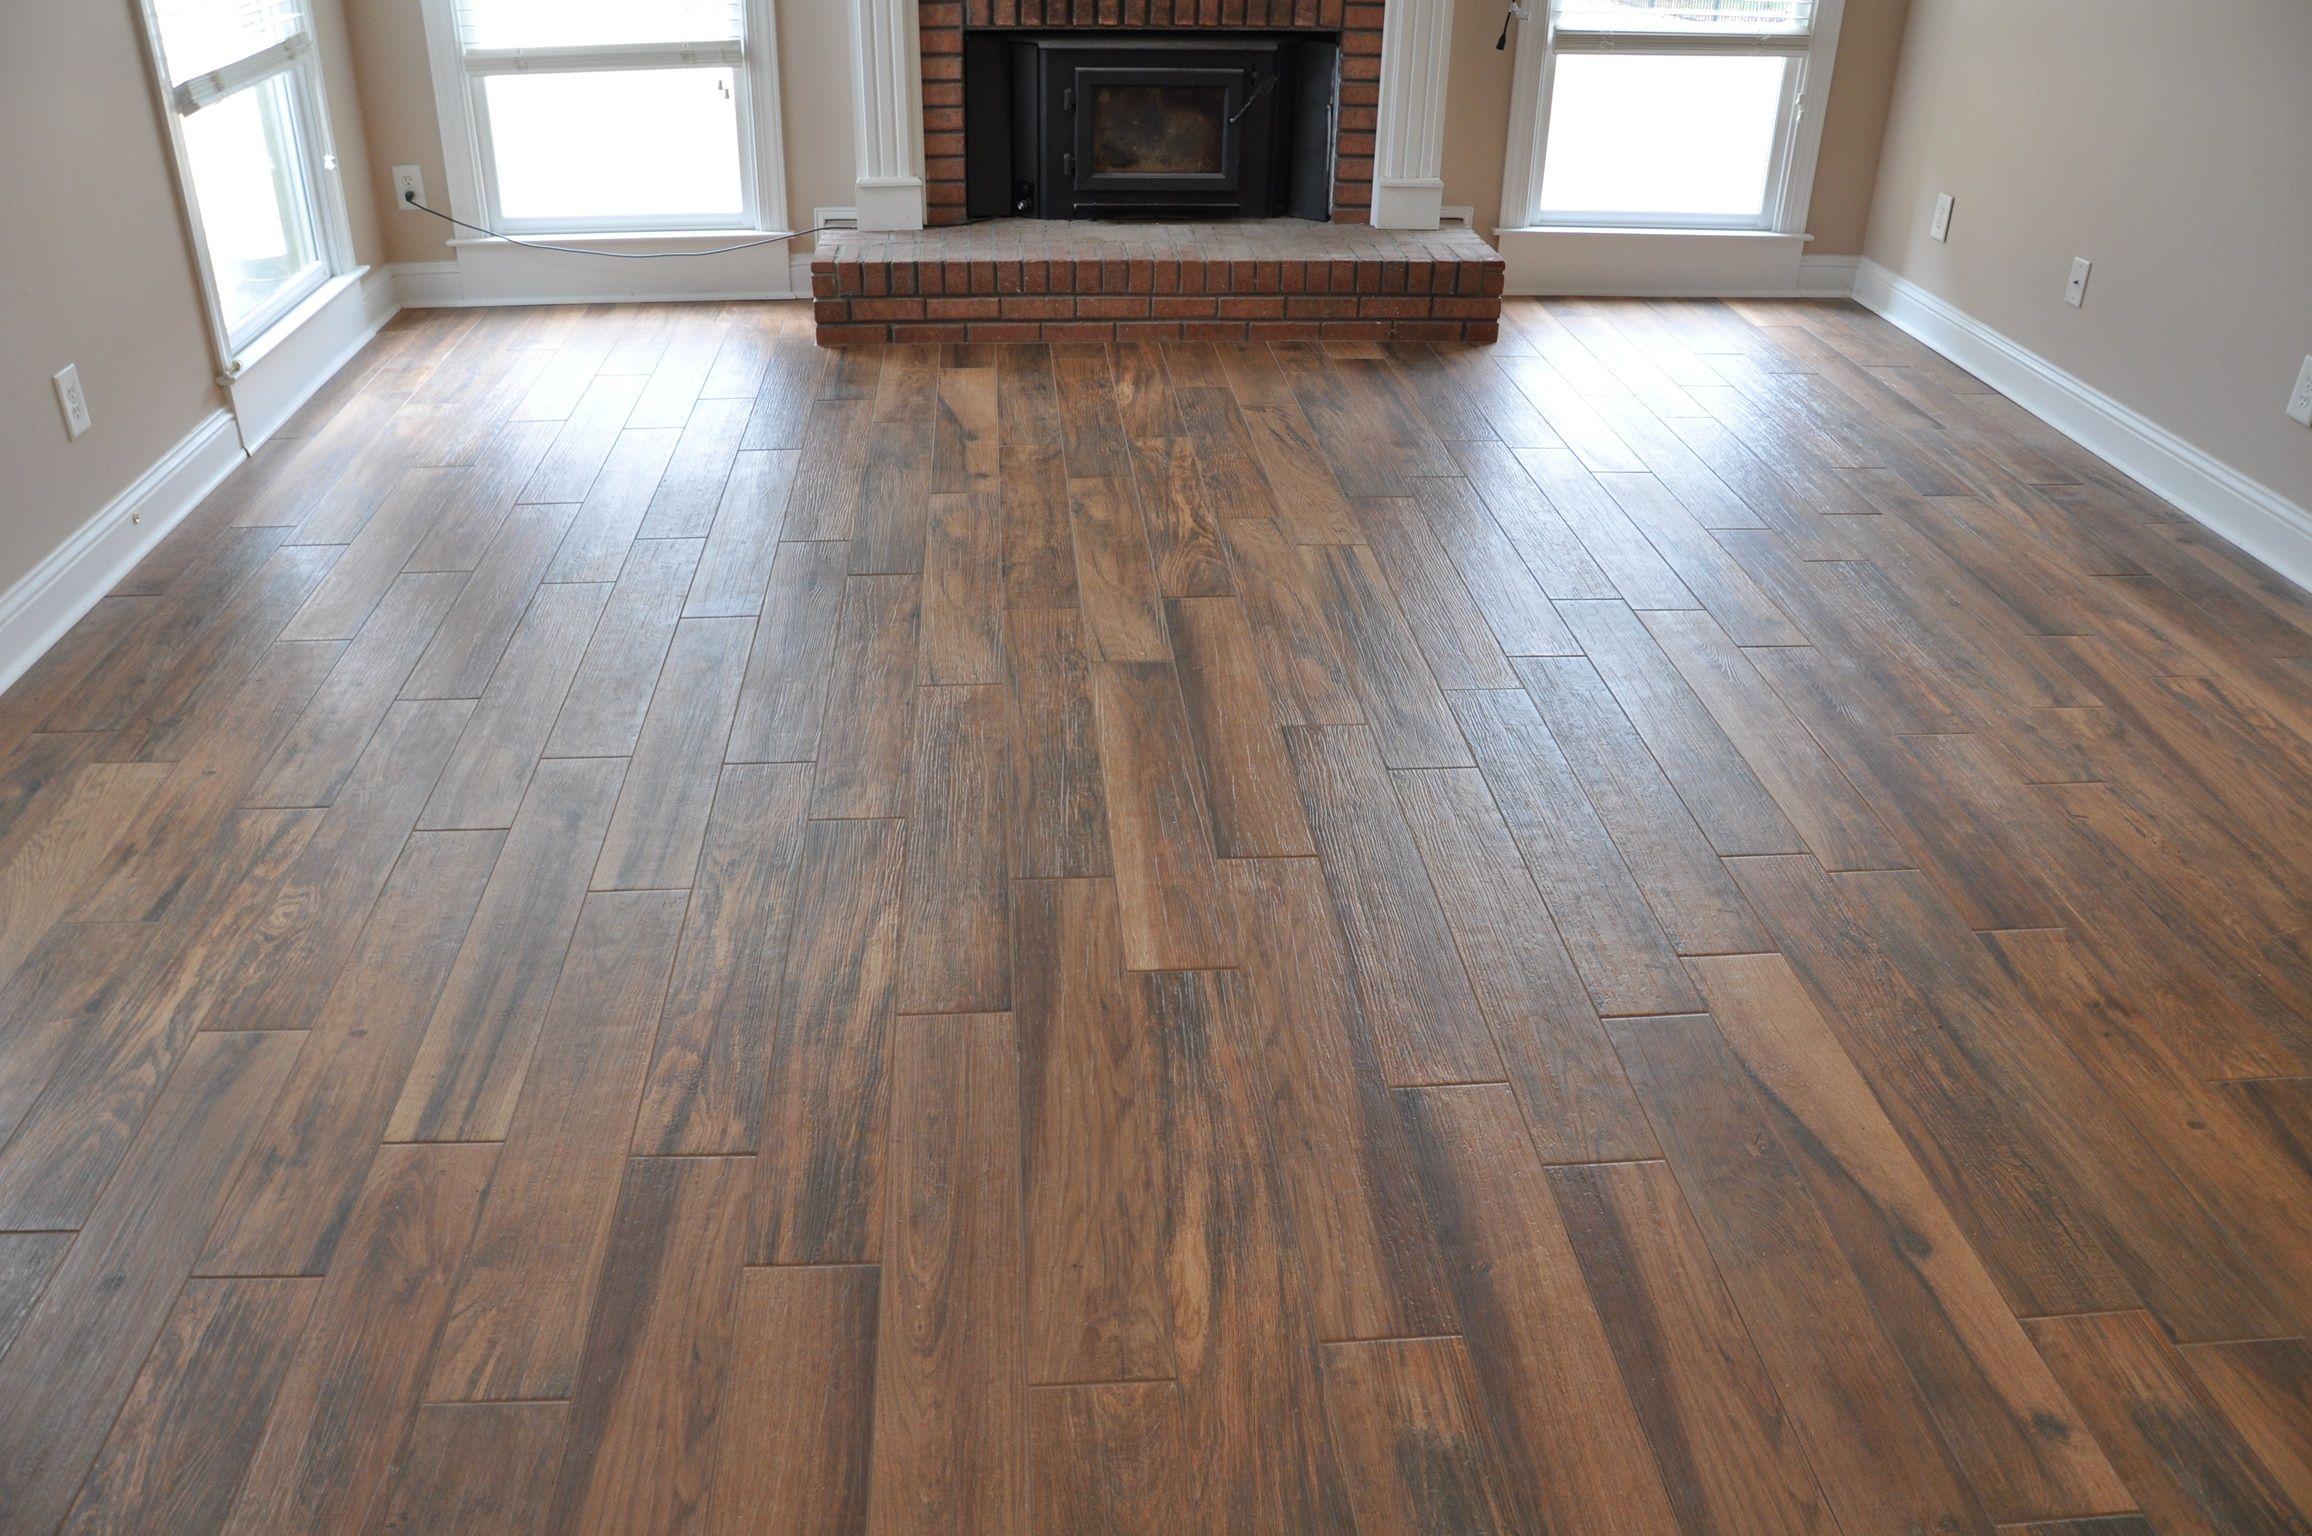 wood look porcelain tile  Google Search  Flooring  Wood